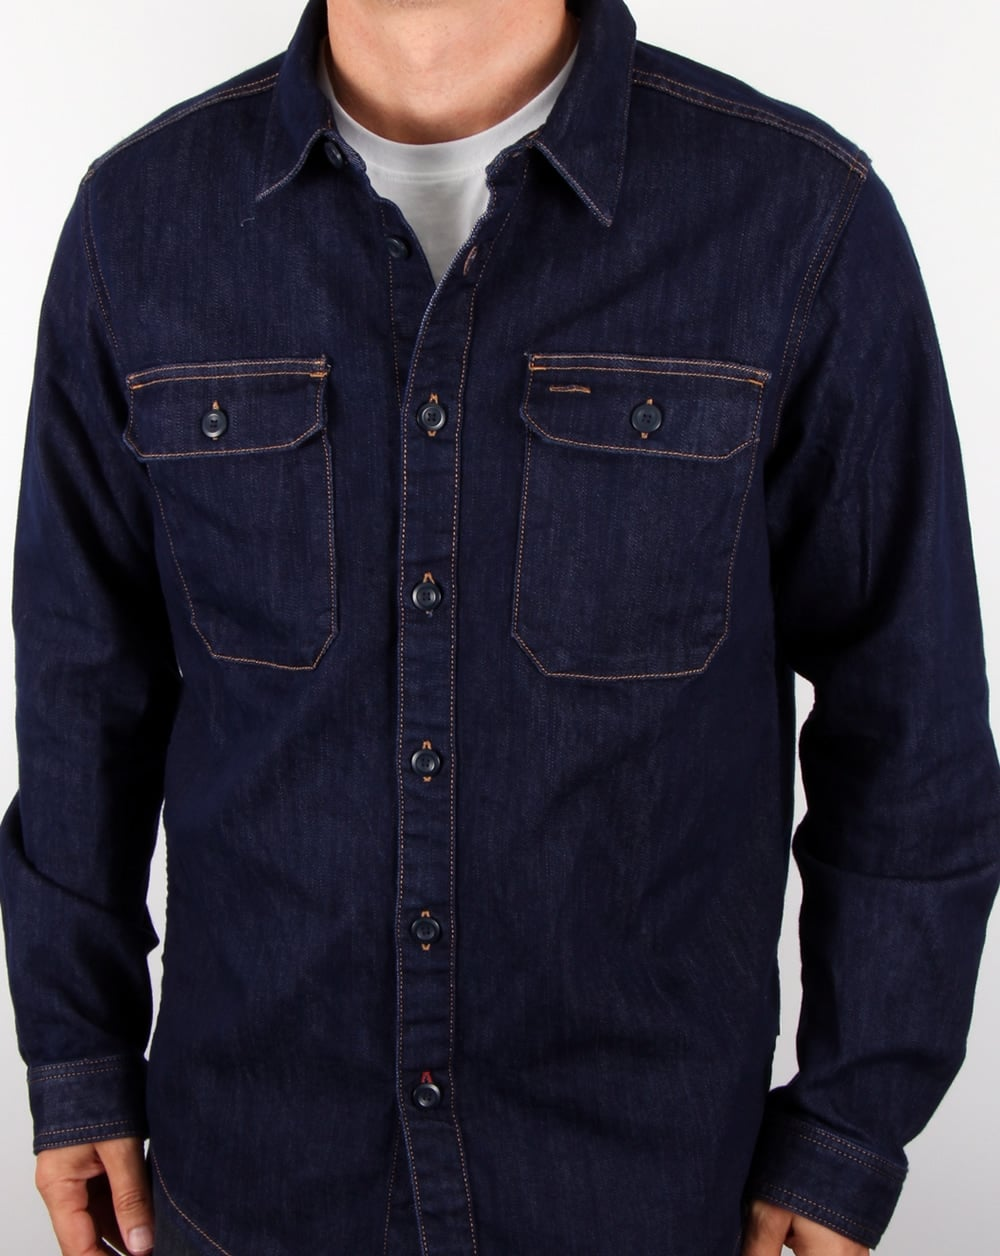 online store 5cbc5 1fd1d Patagonia Workwear Shirt Dark Denim